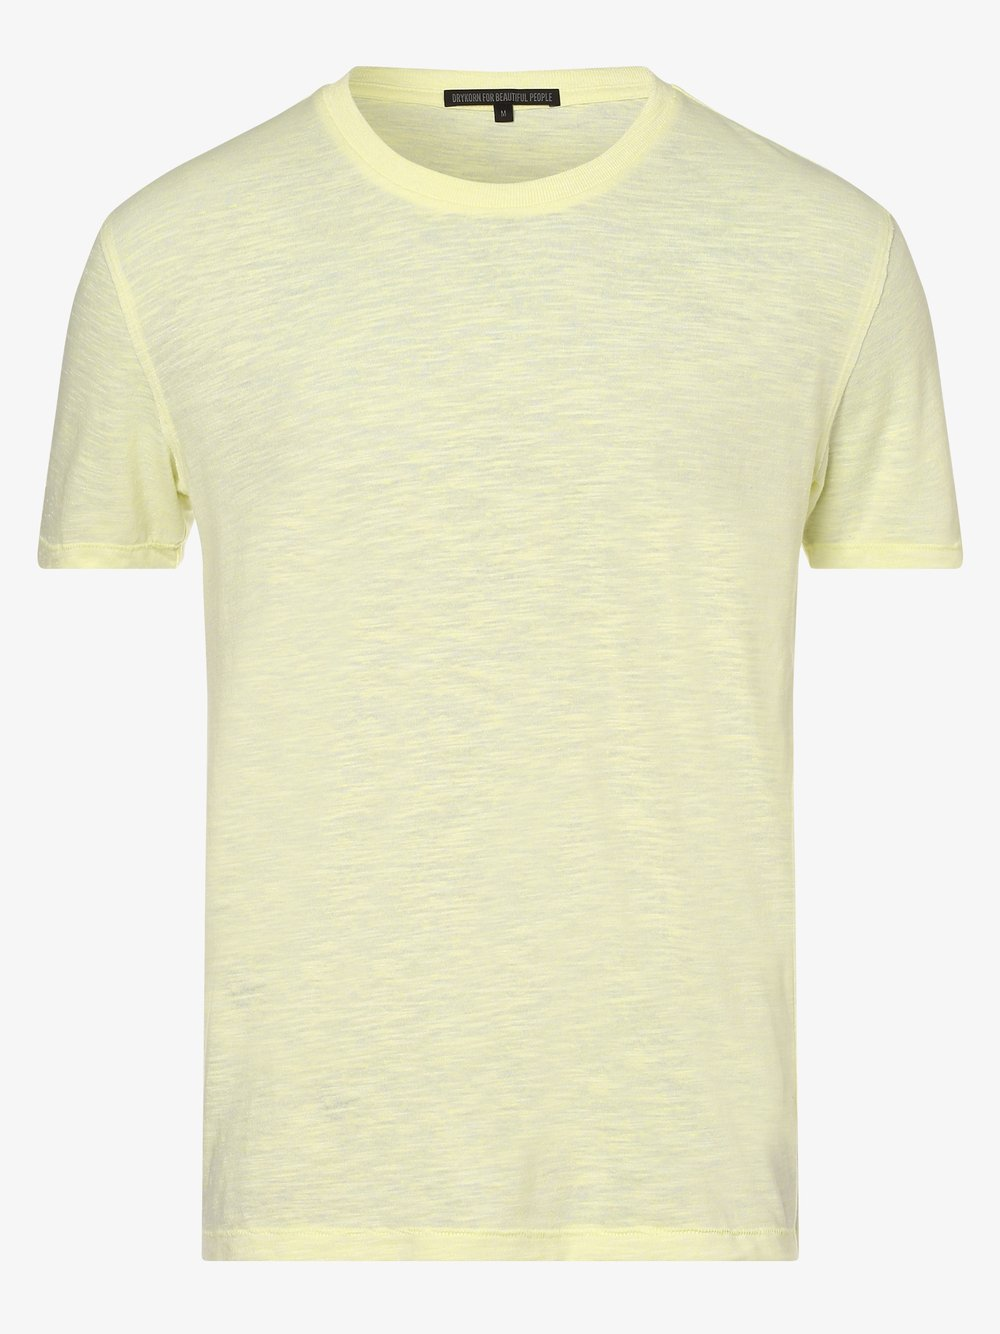 Drykorn - T-shirt męski – Lias, żółty